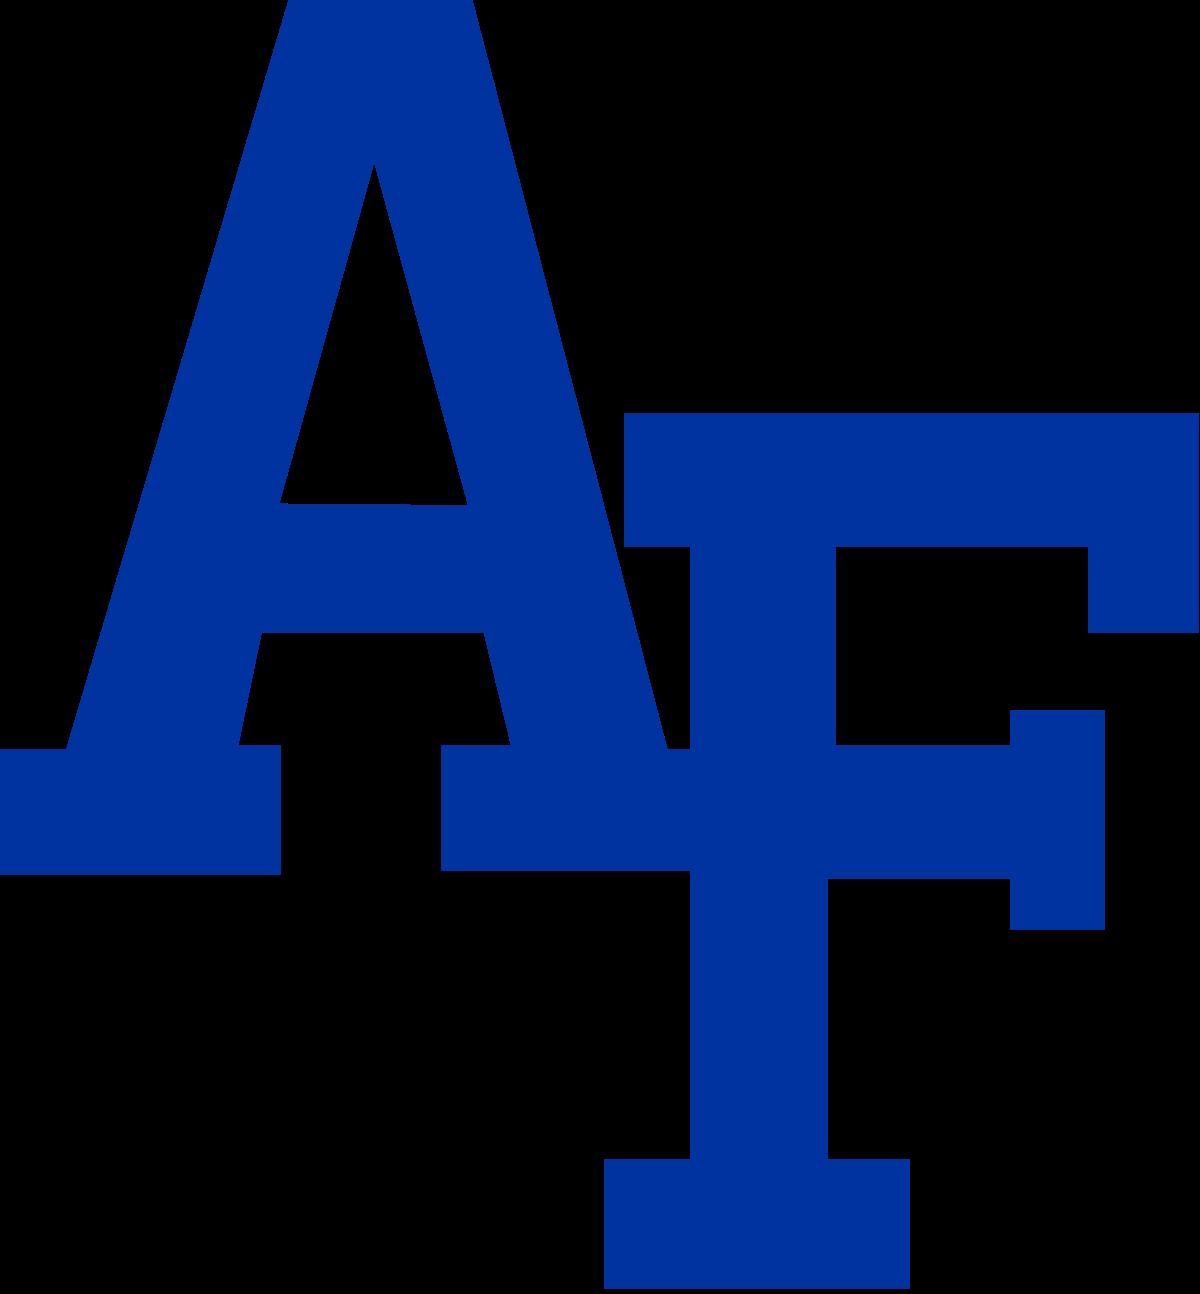 Air Force Falcons Football Wikipedia Falcons Football Air Force Falcon Logo